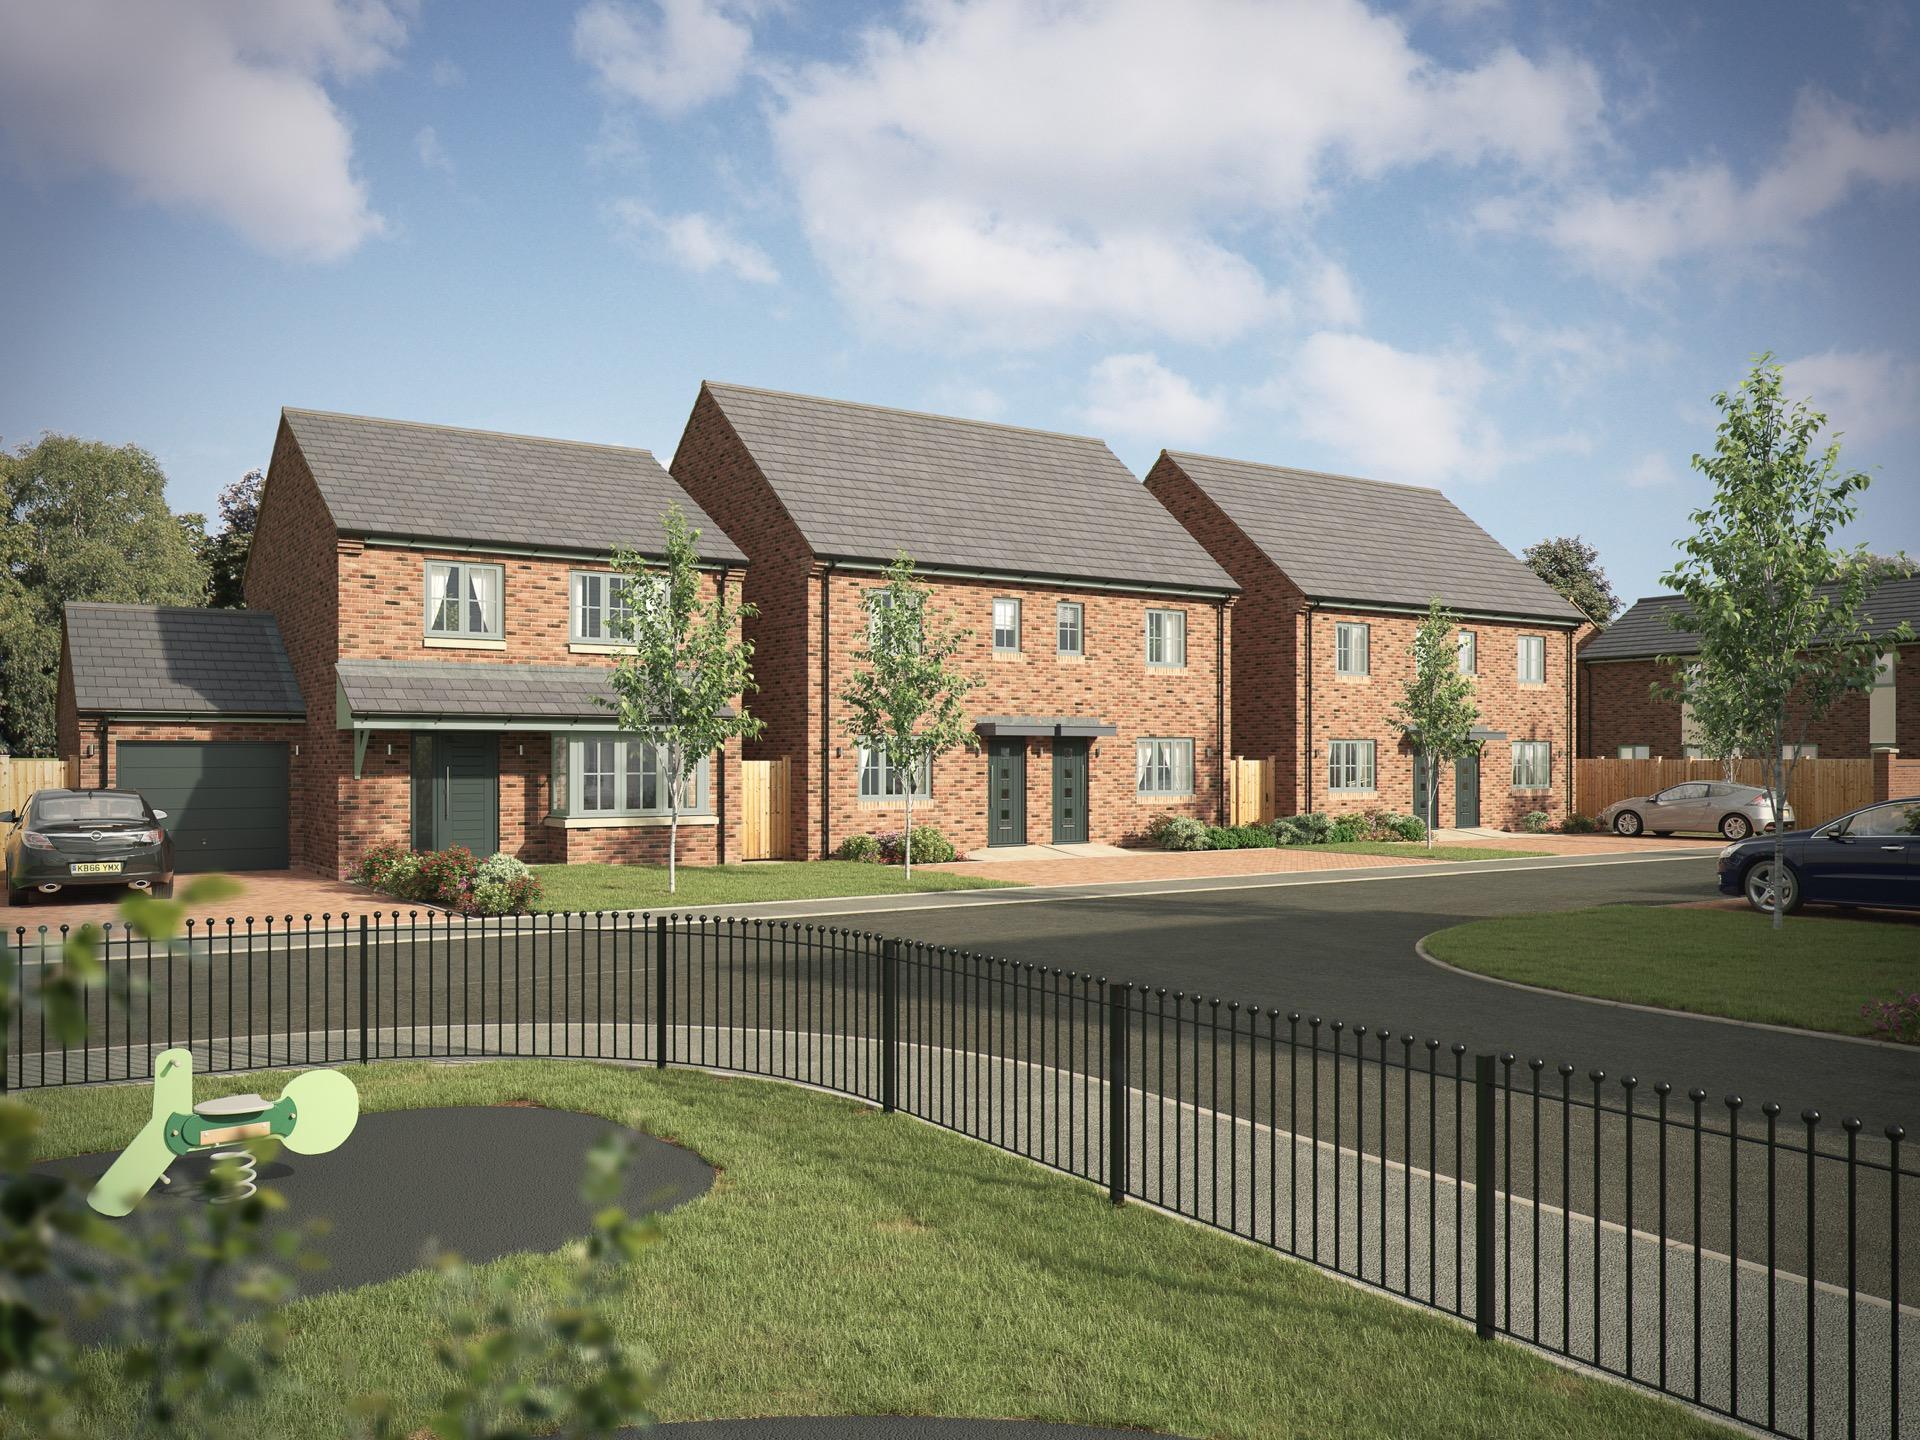 21 new homes confirmed for Market Drayton